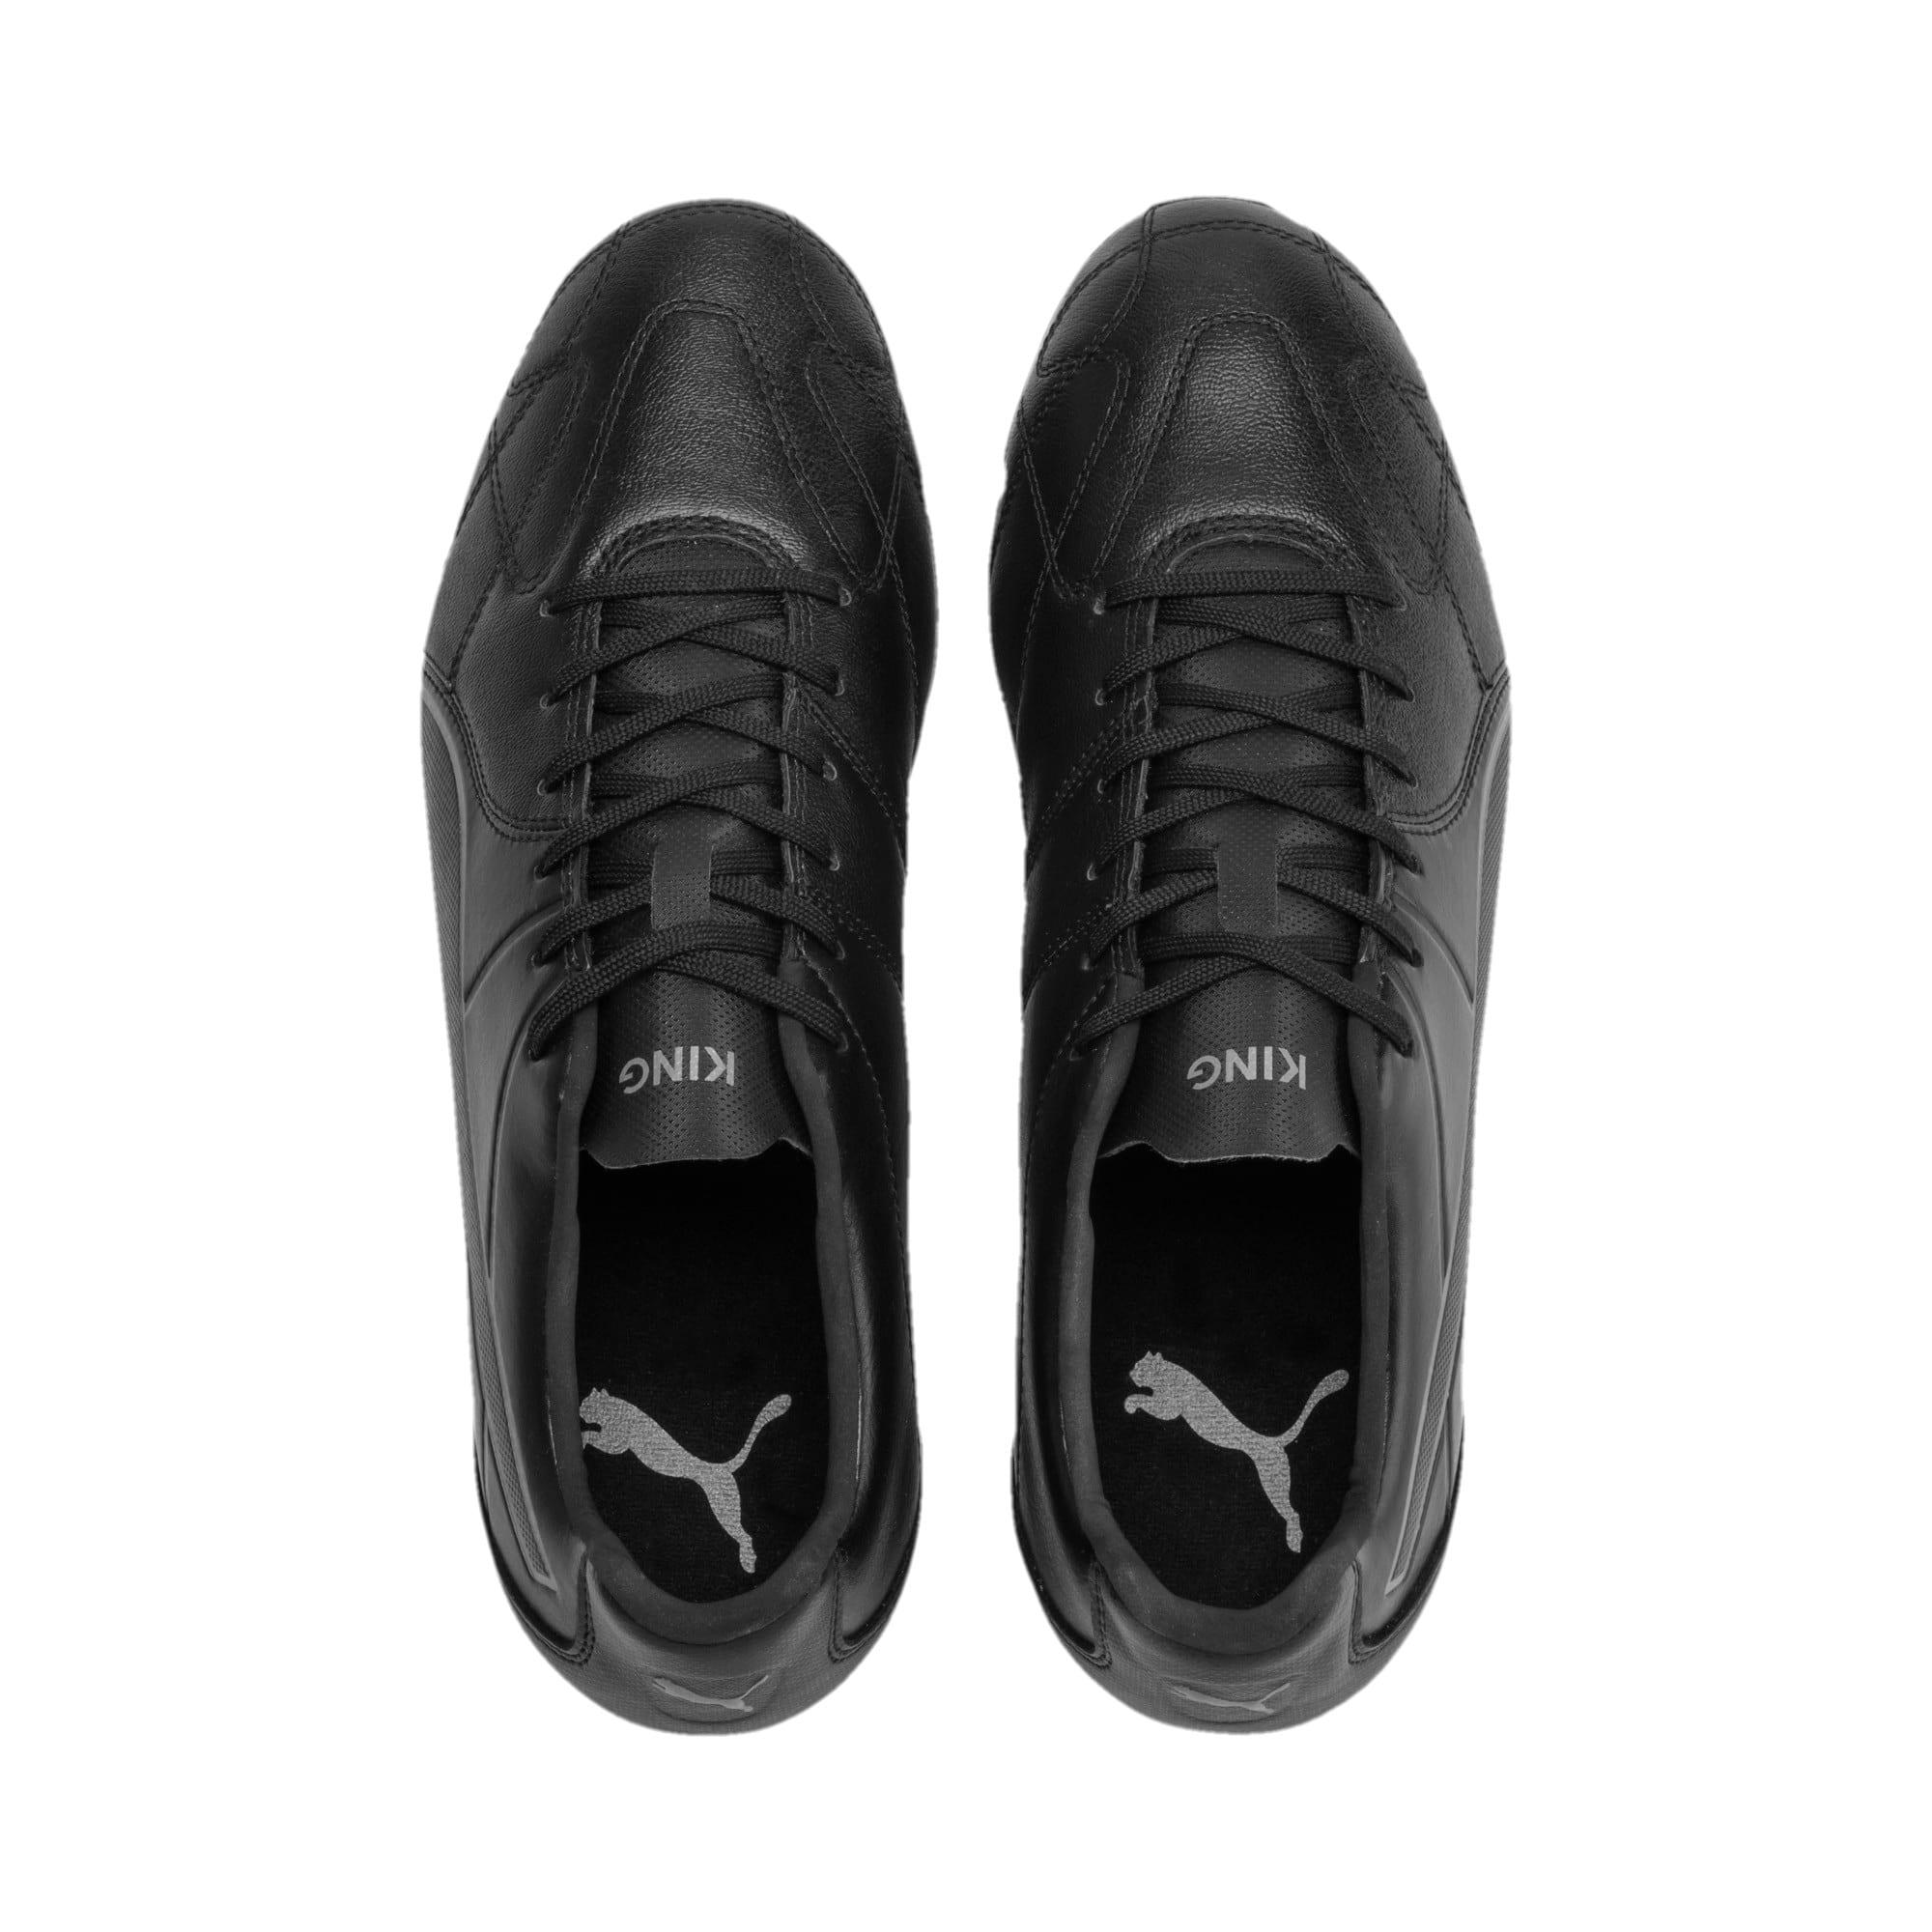 Thumbnail 6 of KING Hero H8 Men's Rugby Boots, Puma Black-Puma Aged Silver, medium